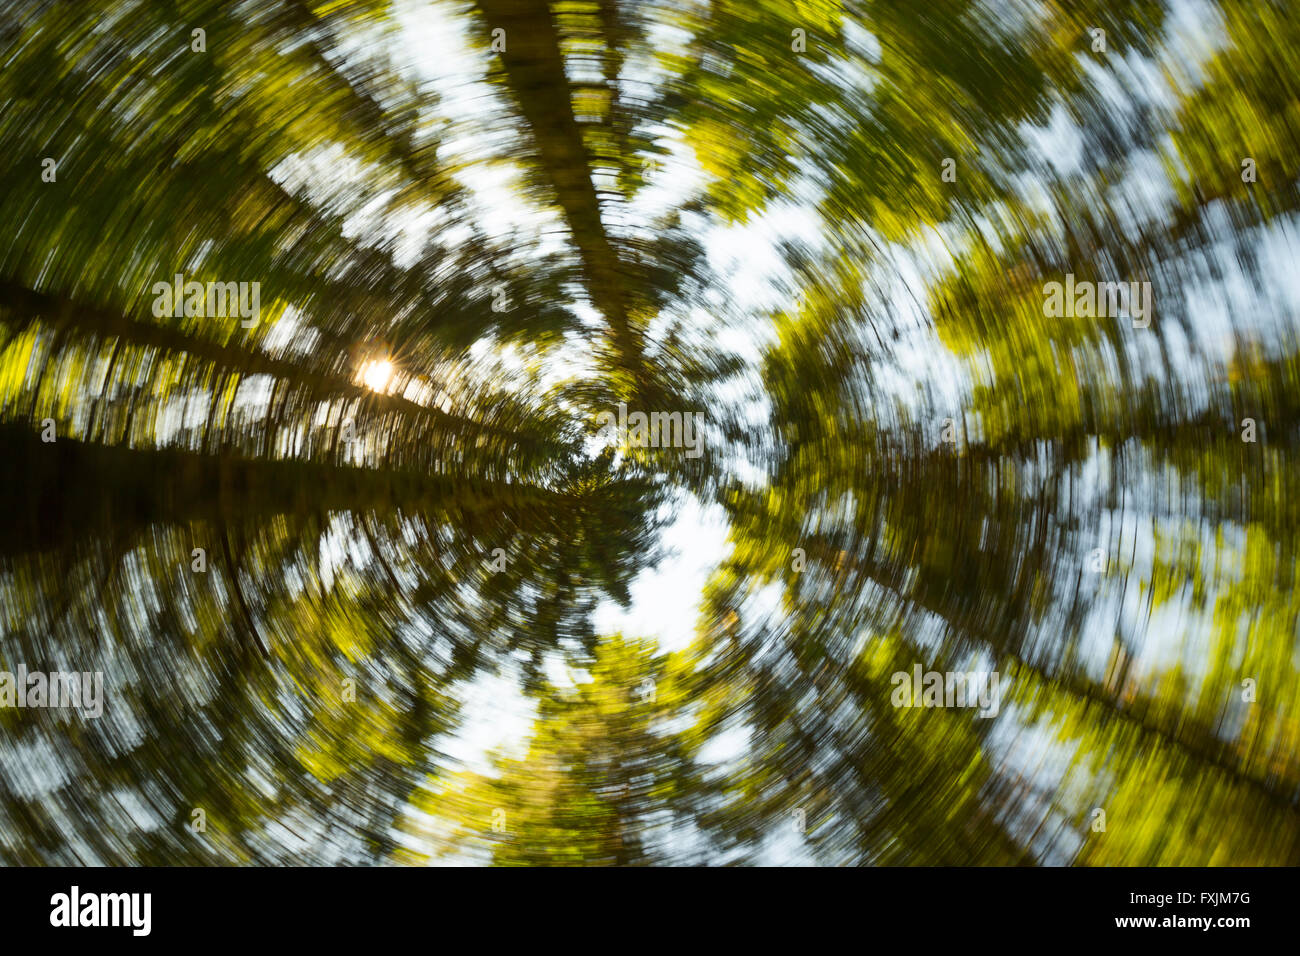 Bosque en movimiento circular hacia arriba árboles sunny borrosa mover mover Imagen De Stock